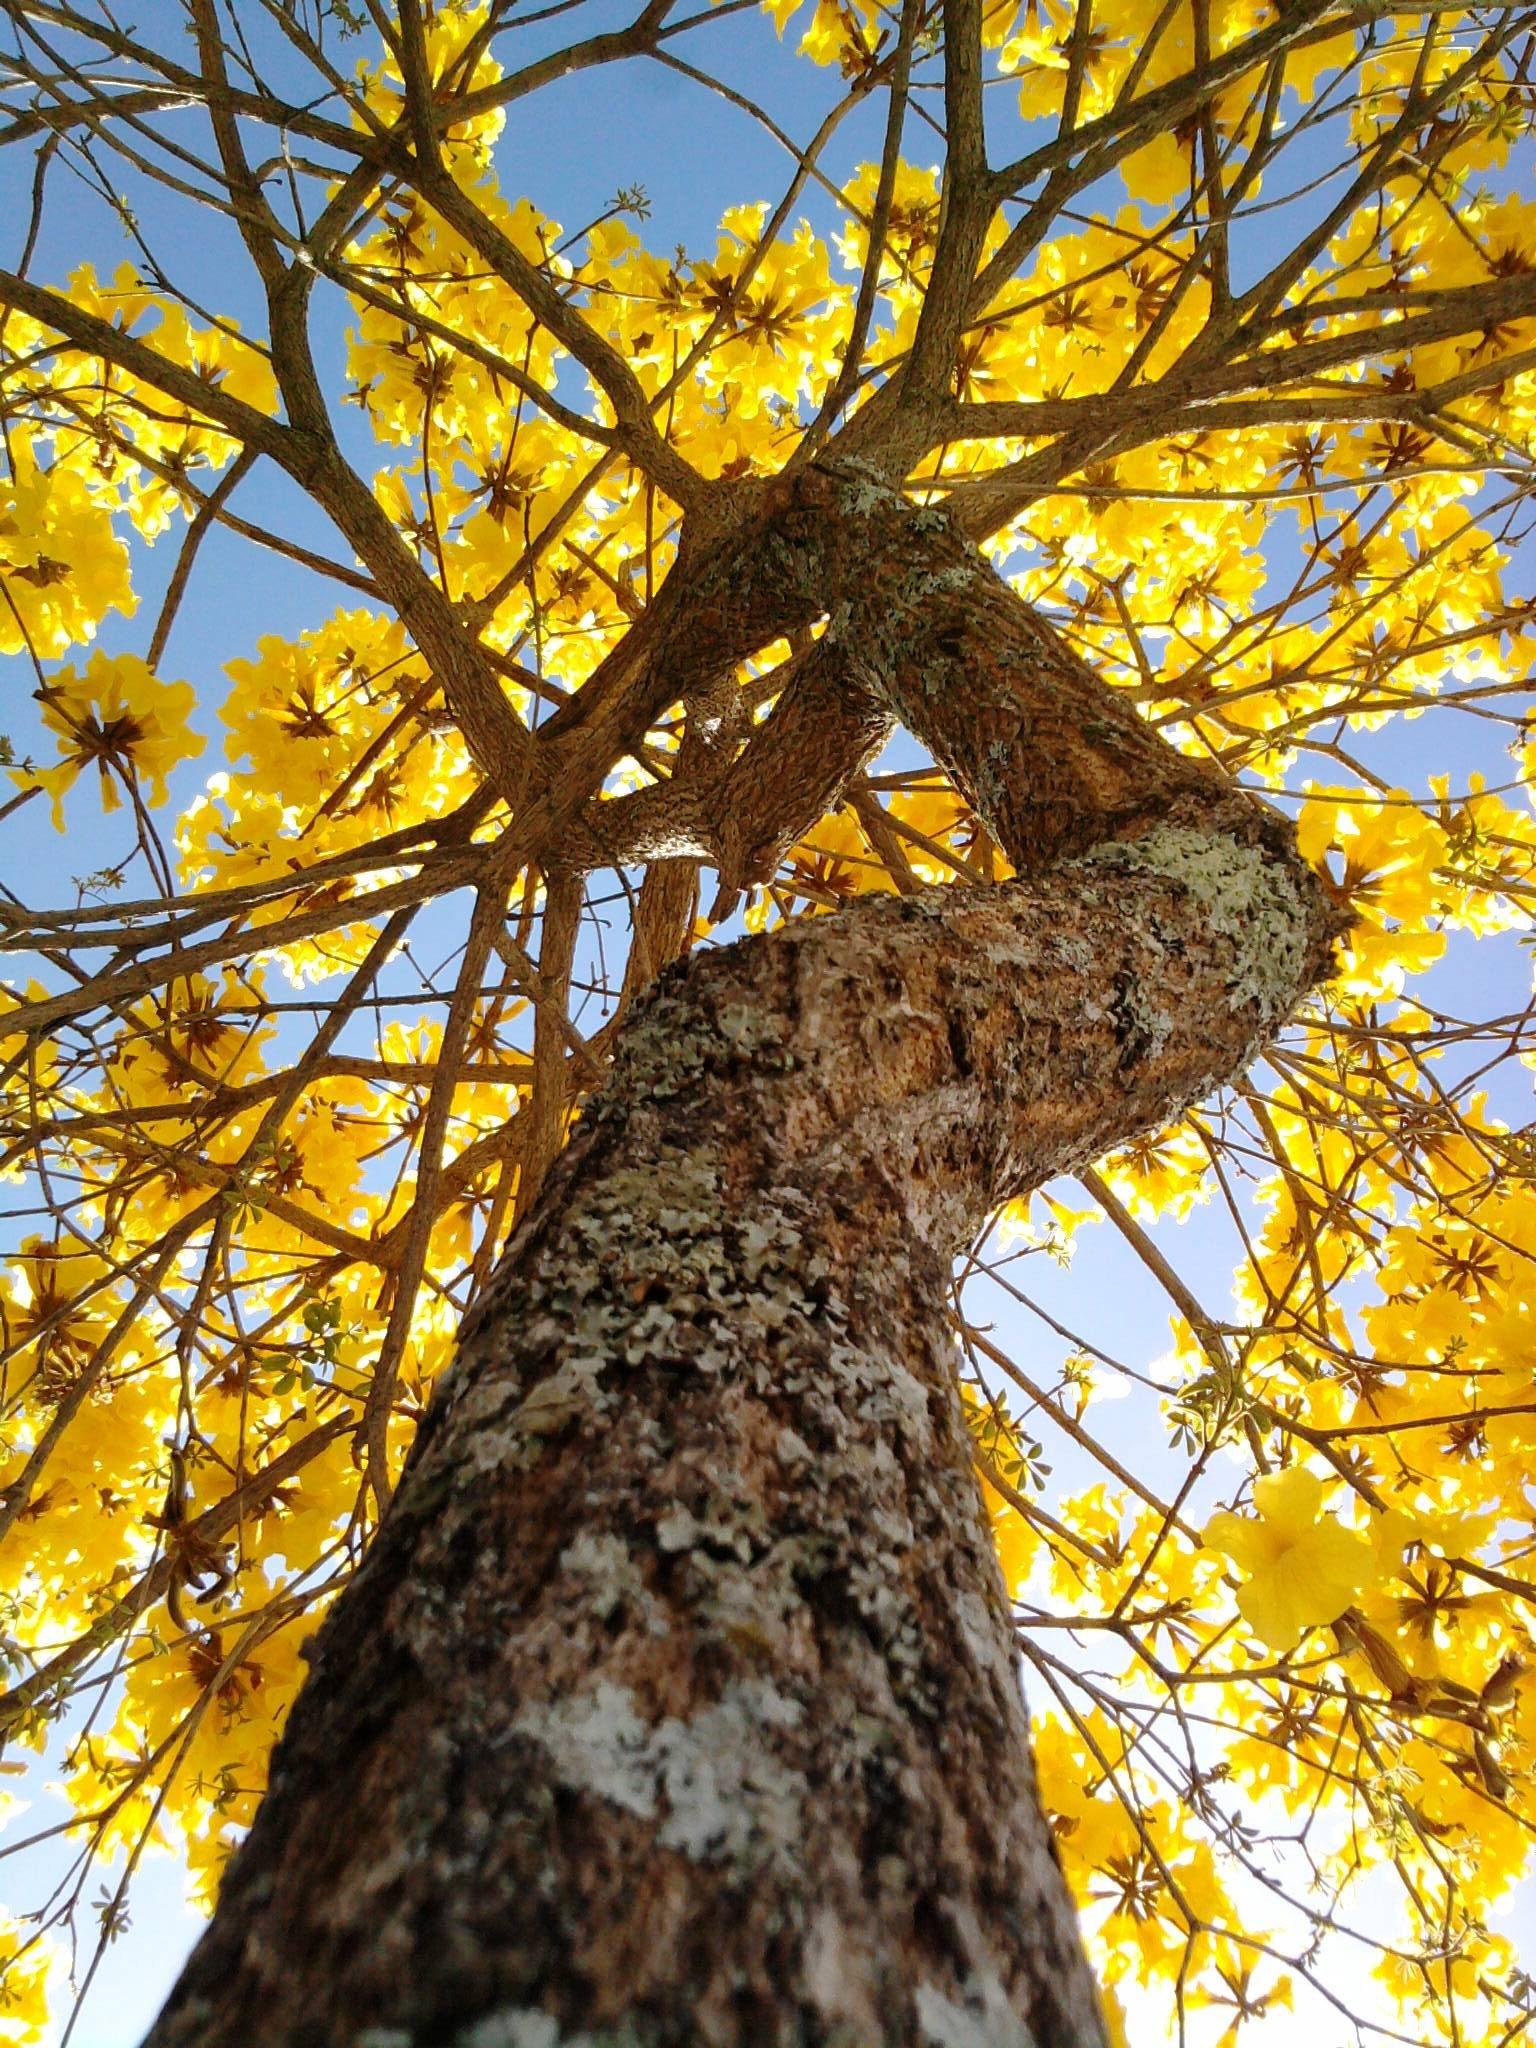 ipe-amarelo-arvore-flores10.jpg